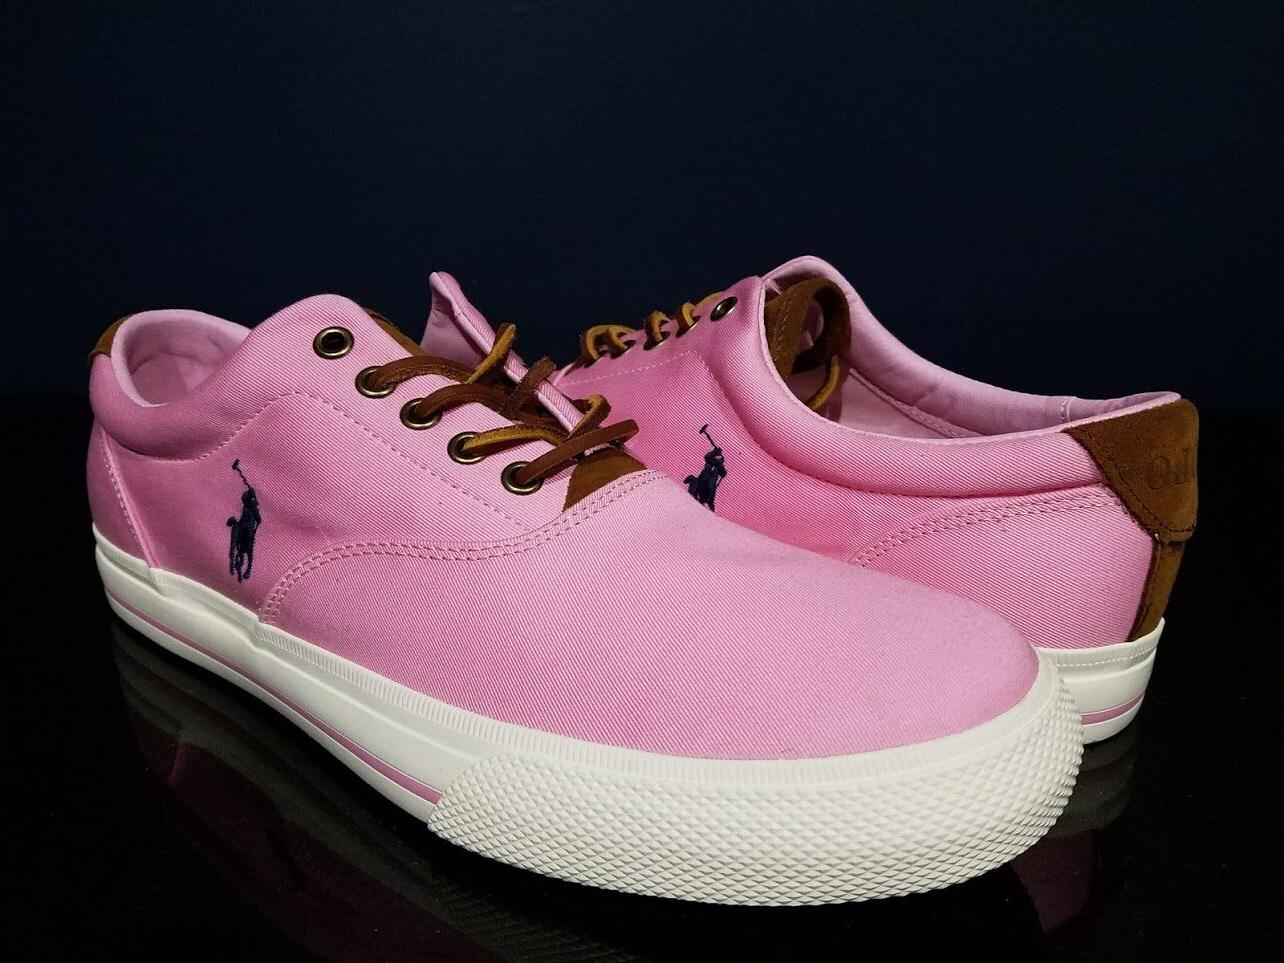 pink polo shoes - 60% OFF - tajpalace.net